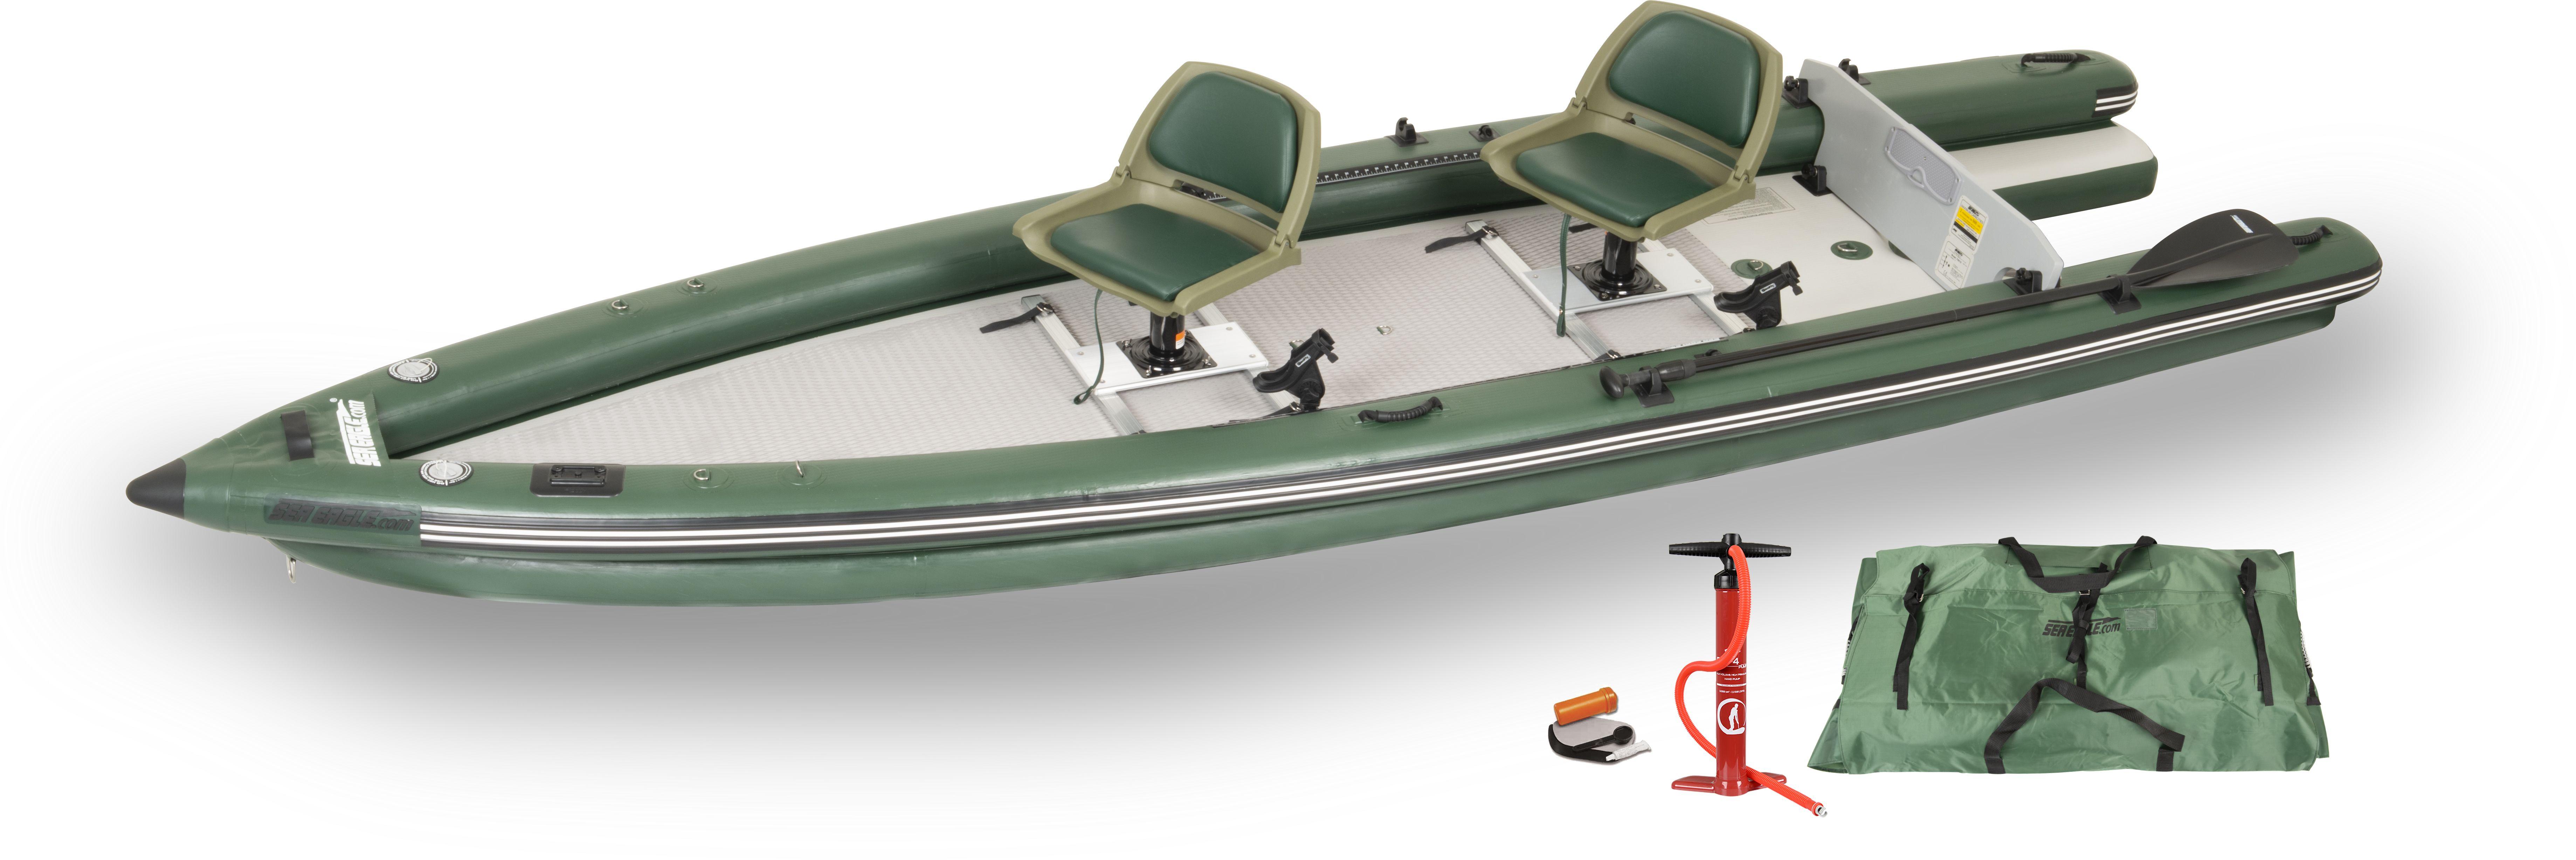 Sea Eagle FSK16 Inflatable FishSkiff 16 Frameless Fishing Boat – 2 Person Swivel Seat Package